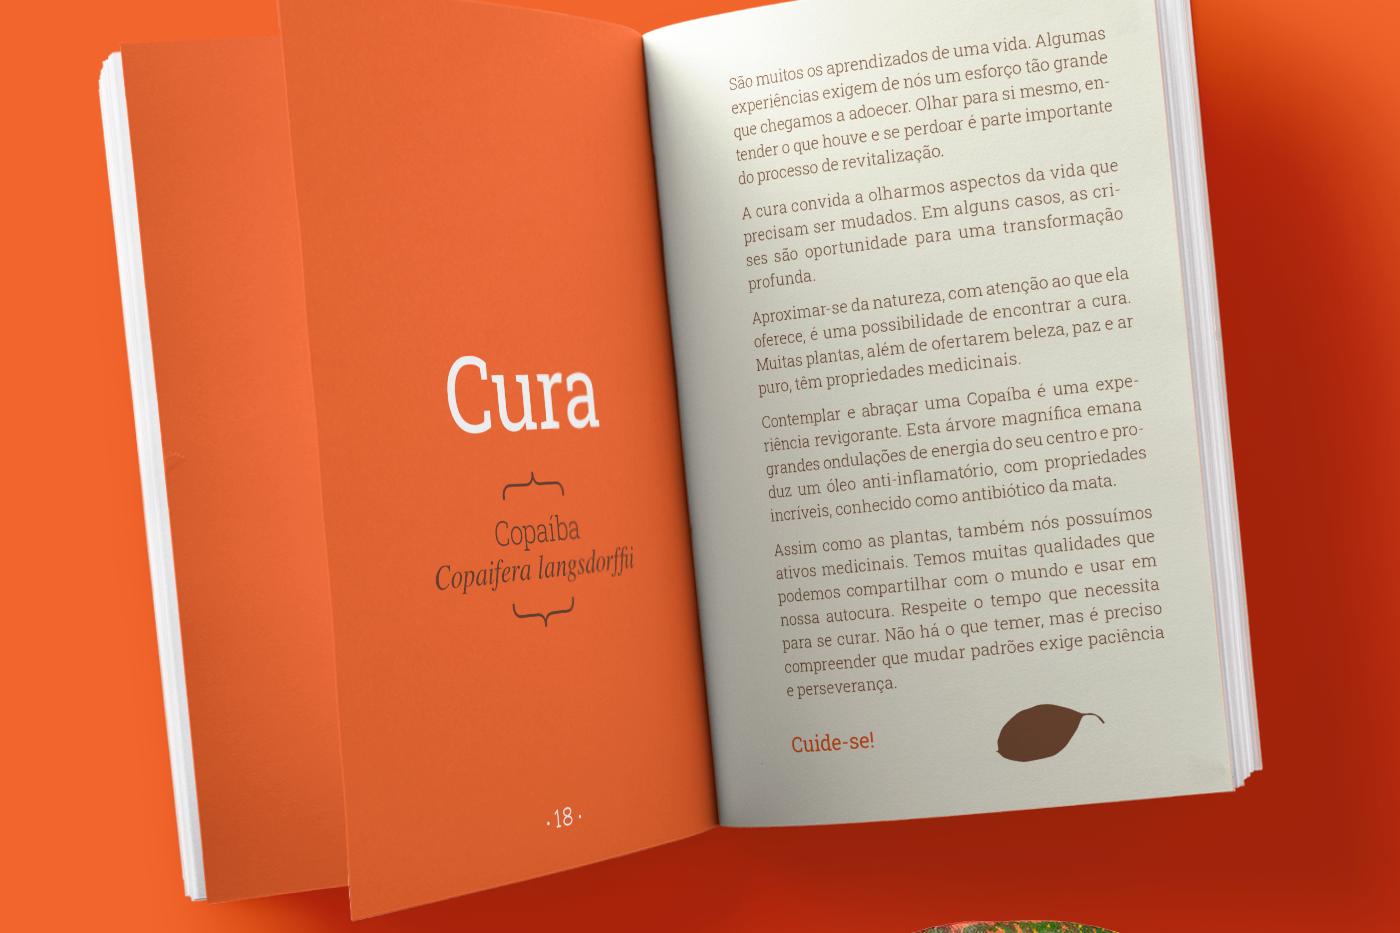 livro_dentro_4x4_laranja.png